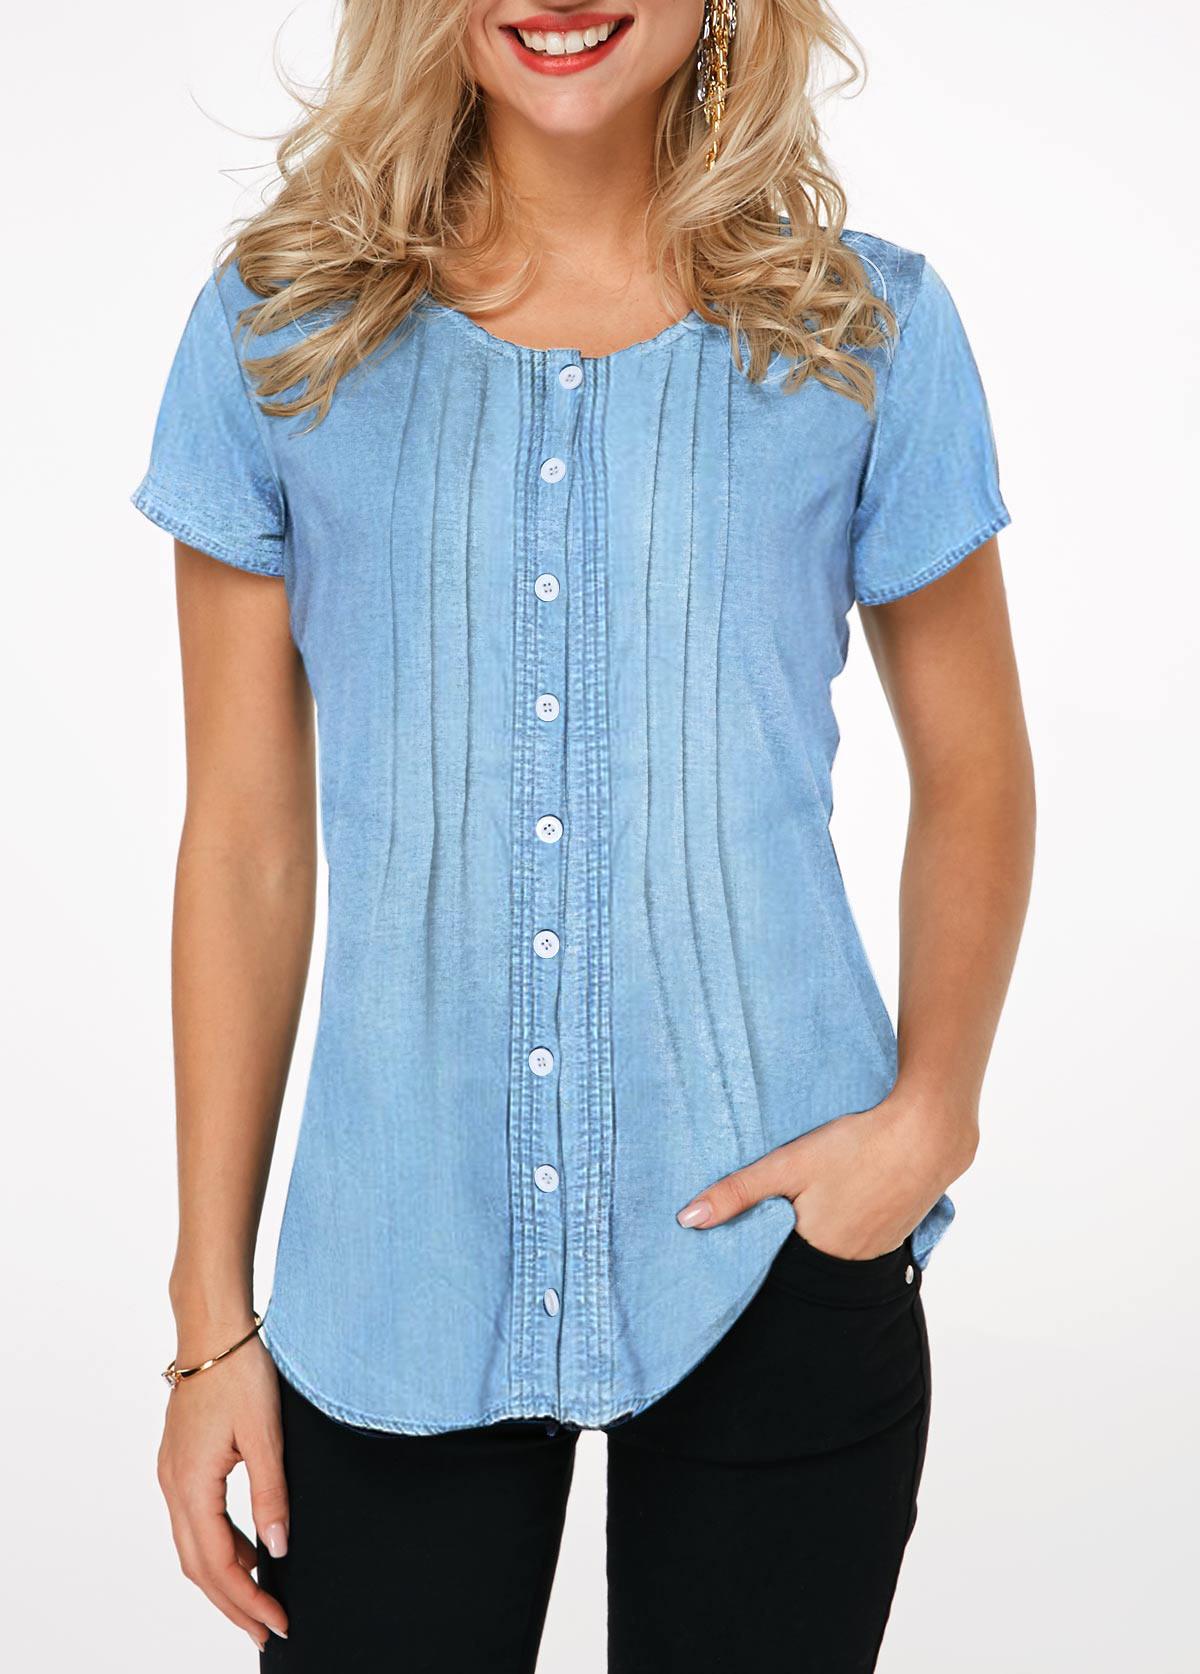 Crinkle Chest Button Up Denim Shirt